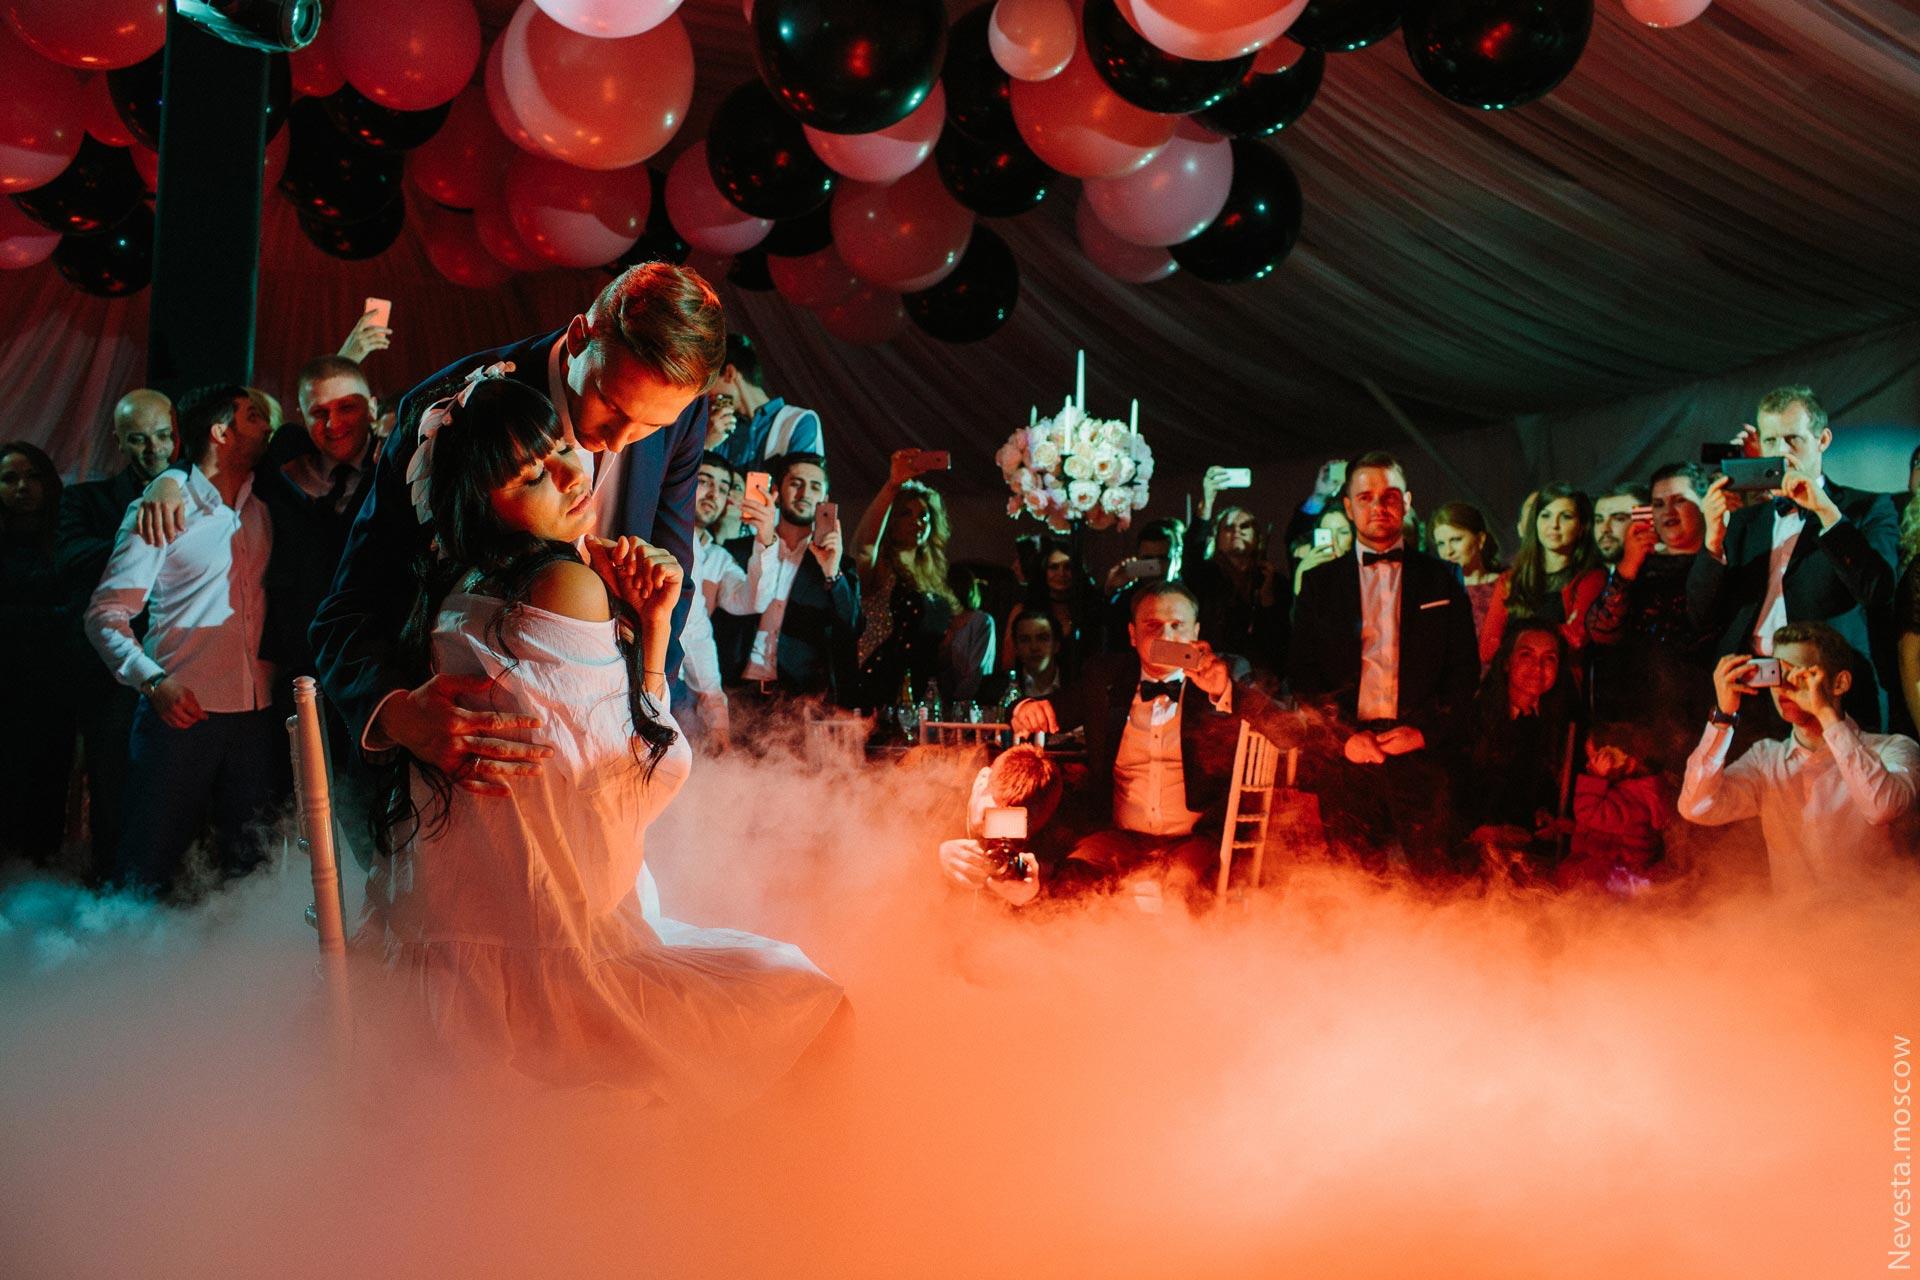 Свадьба Нелли Ермолаевой и Кирилла Андреева фото 50